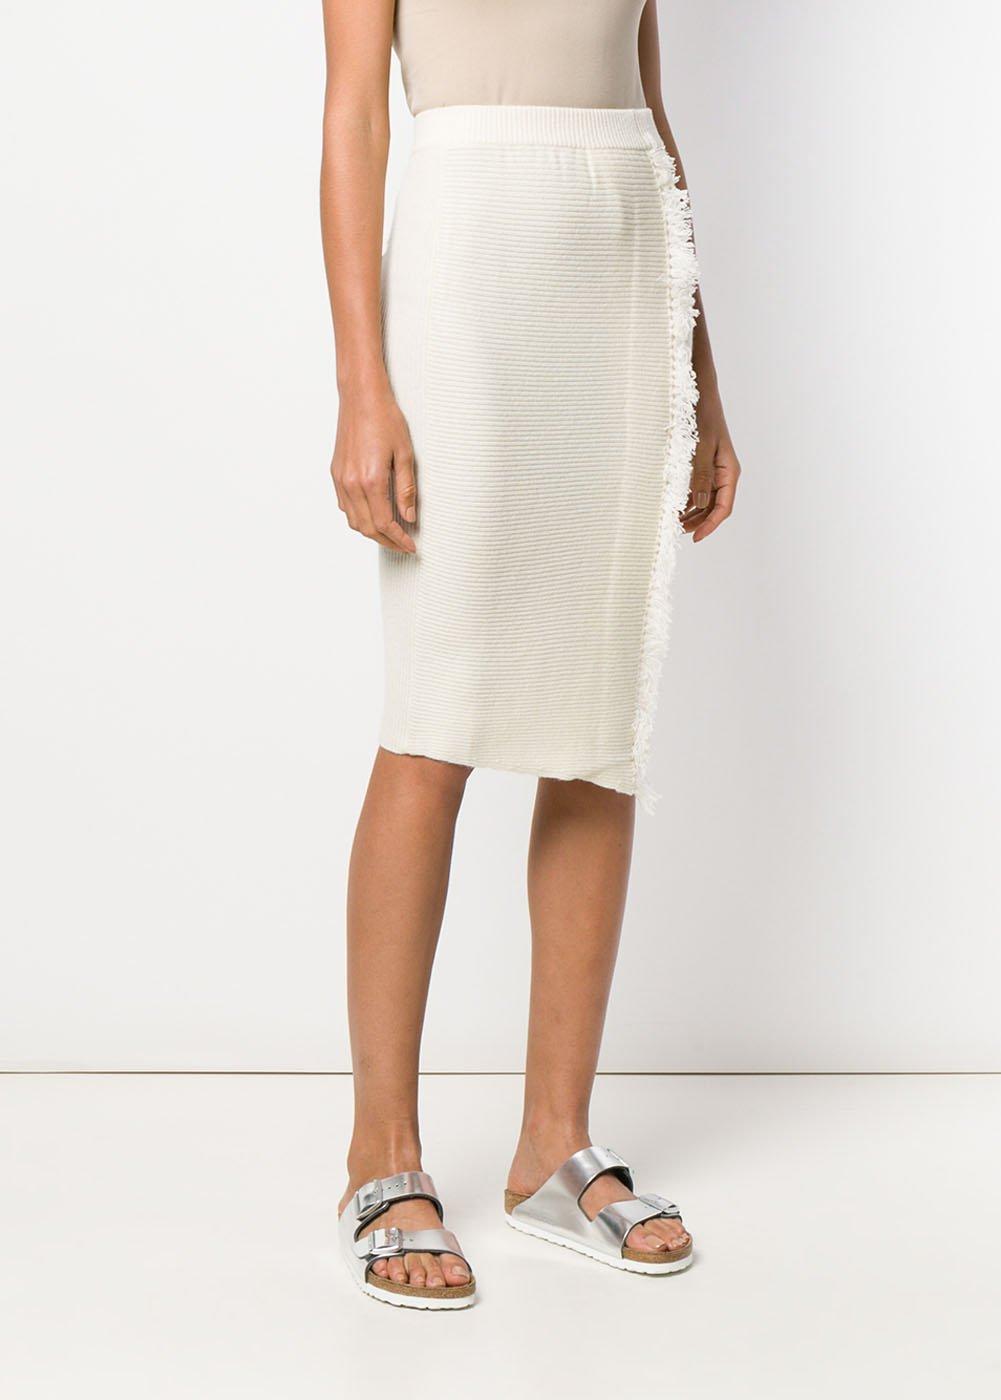 Thirtyfour Knit Skirt - Medium / Ivory